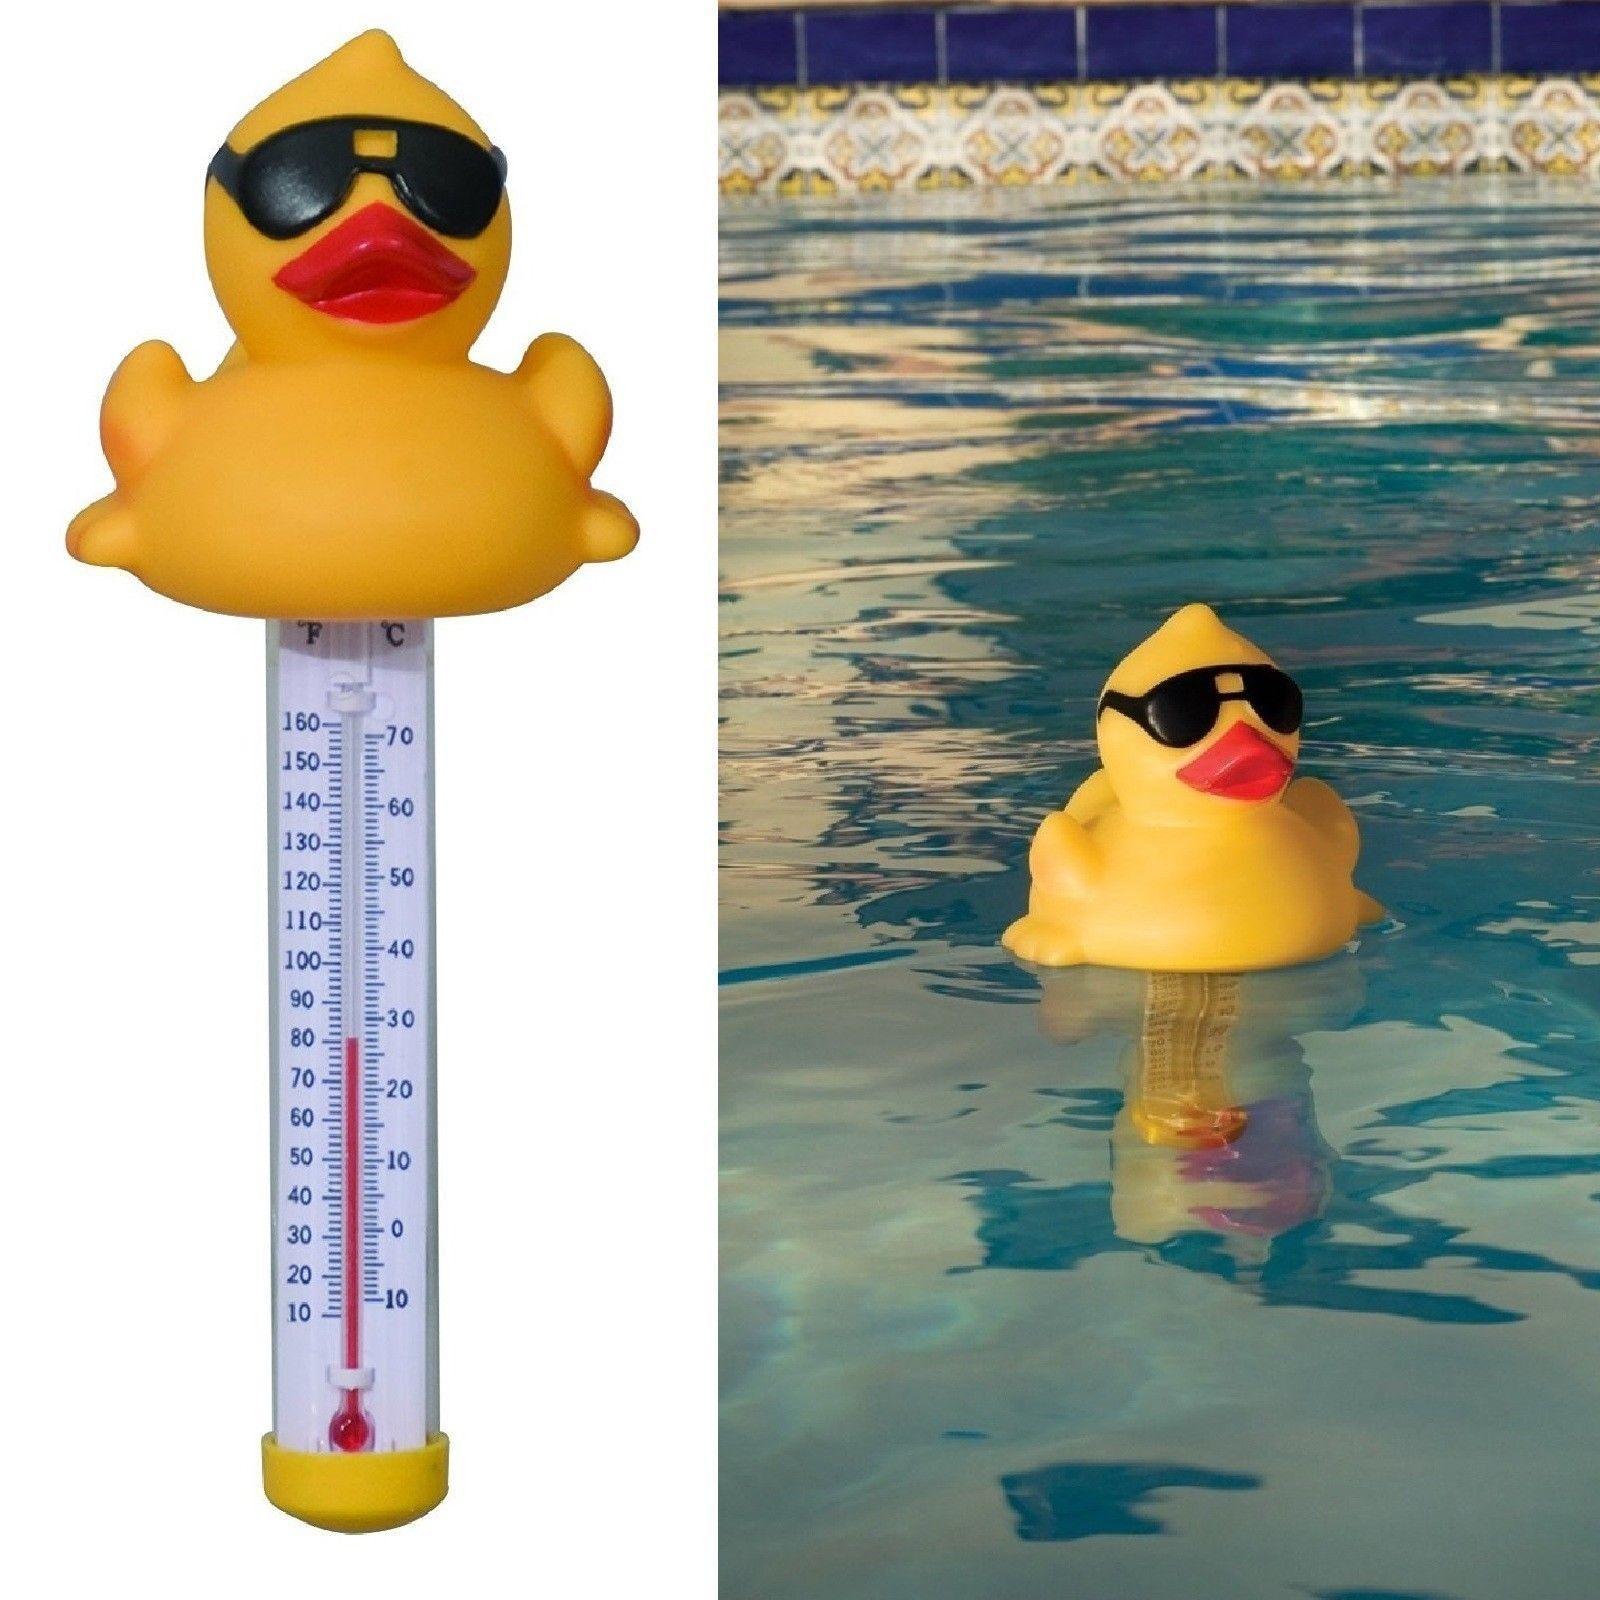 Hot Tub Floating Pool Temperature Sensor Gauge Thermometer M